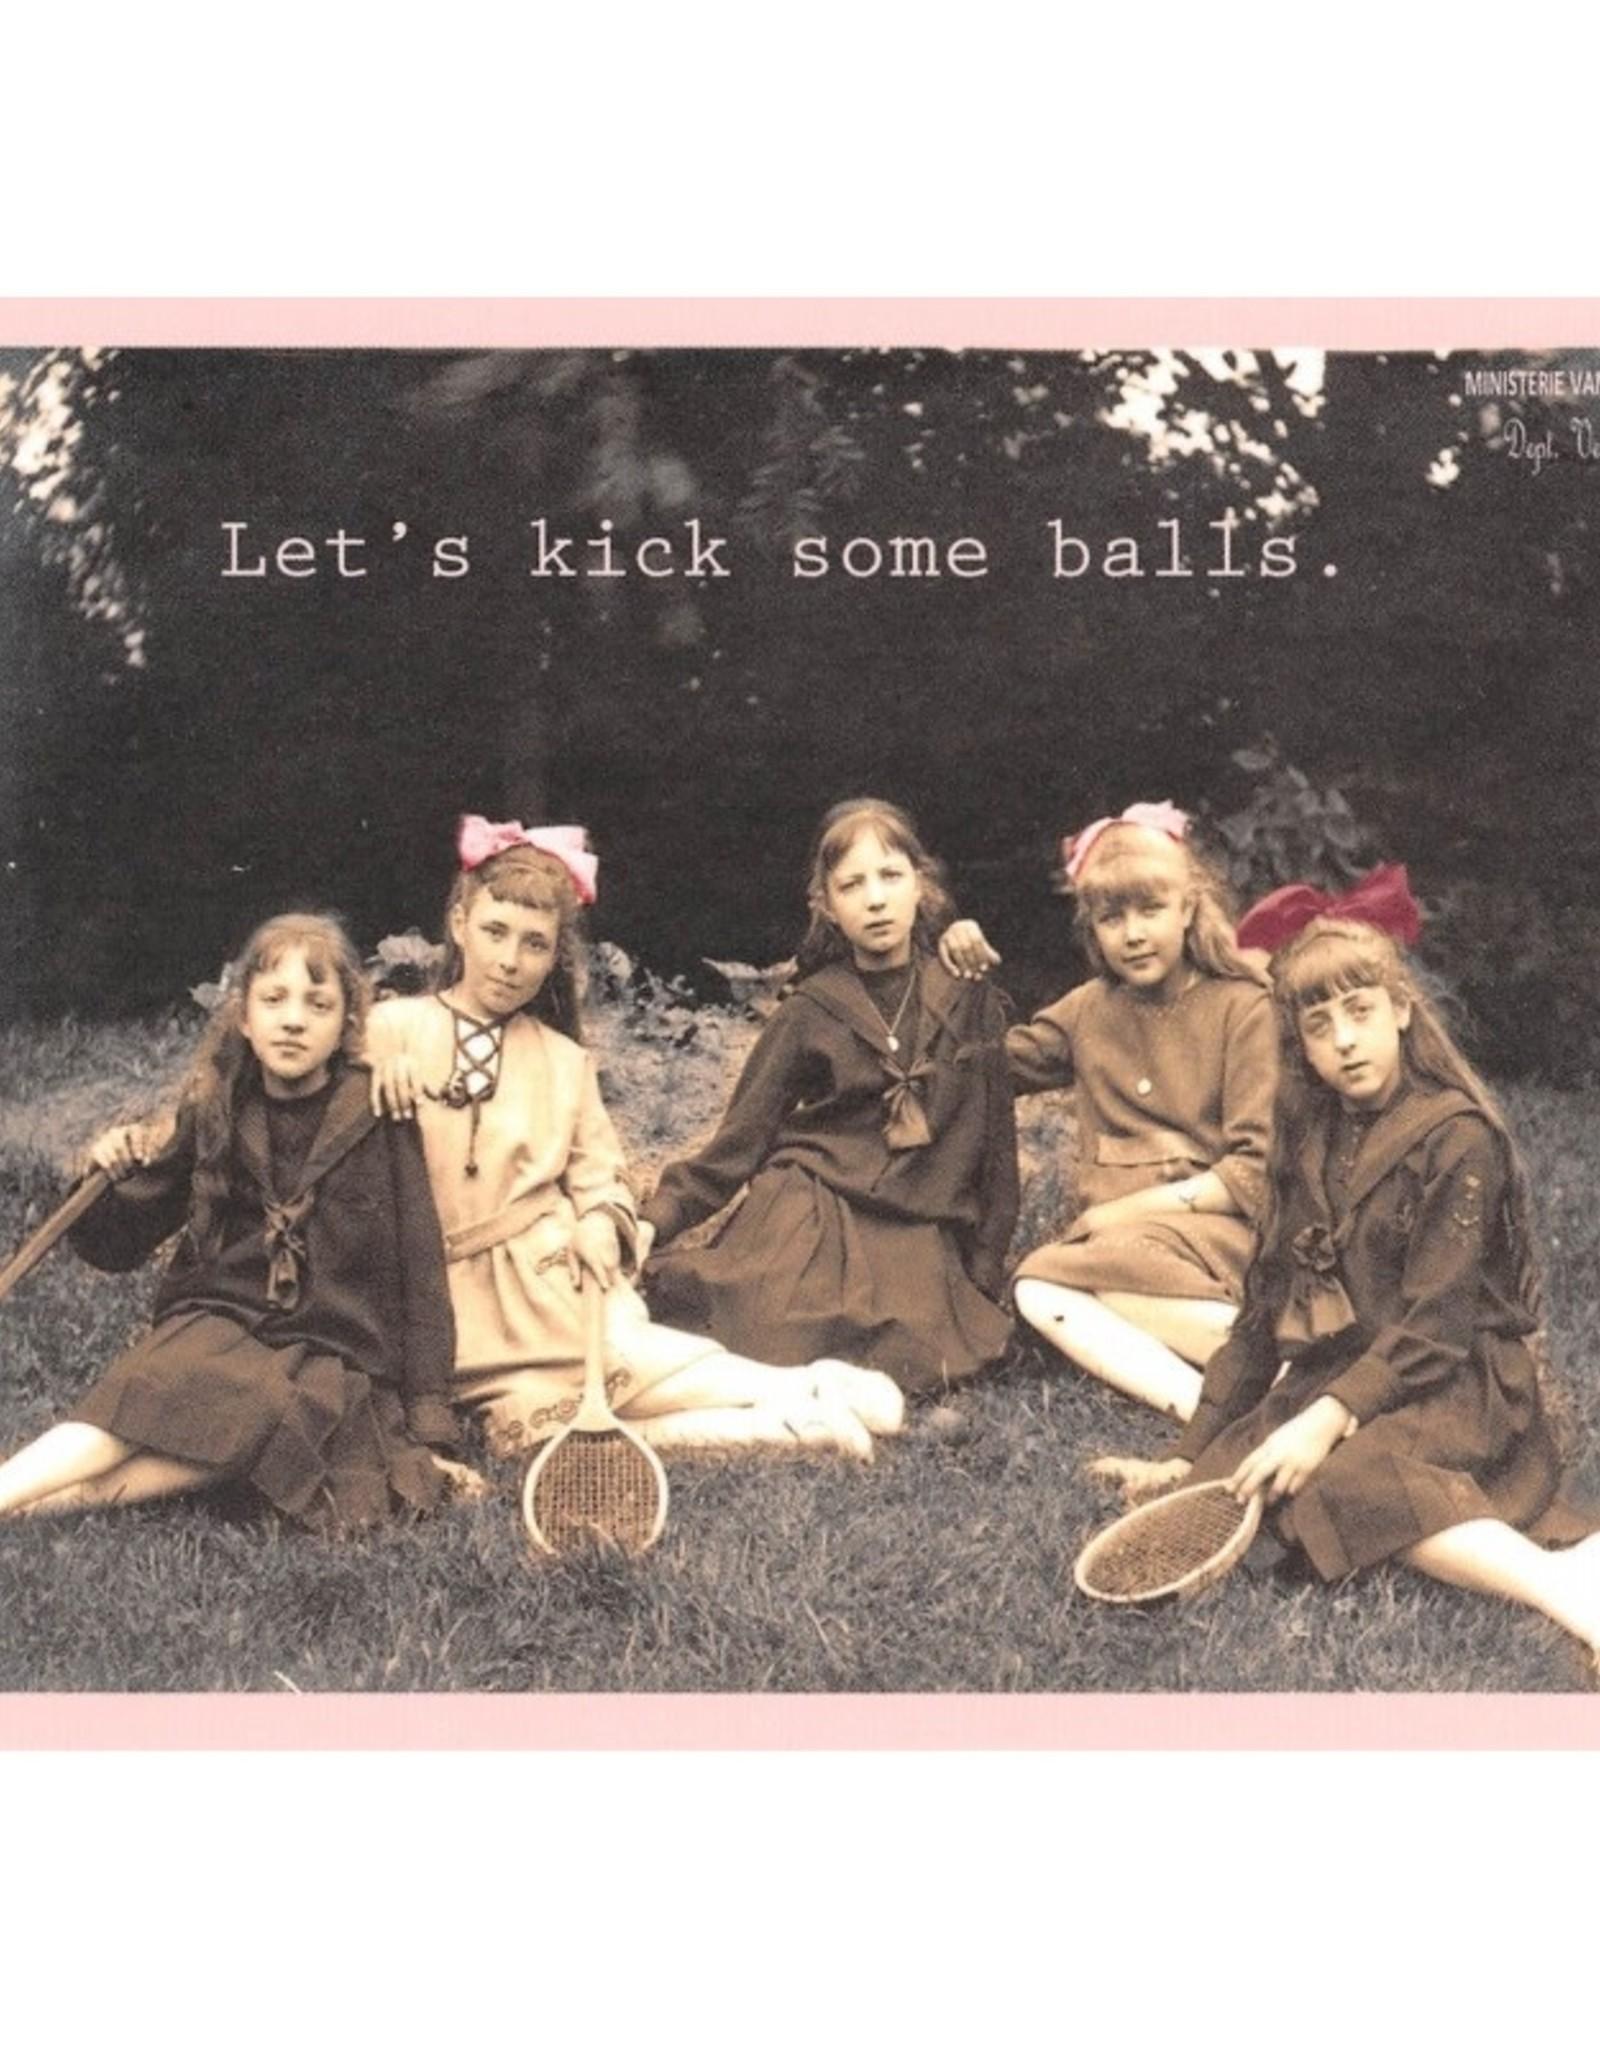 Ministerie van unieke zaken ministerie van unieke zaken kaart a 6 Let's kick some balls